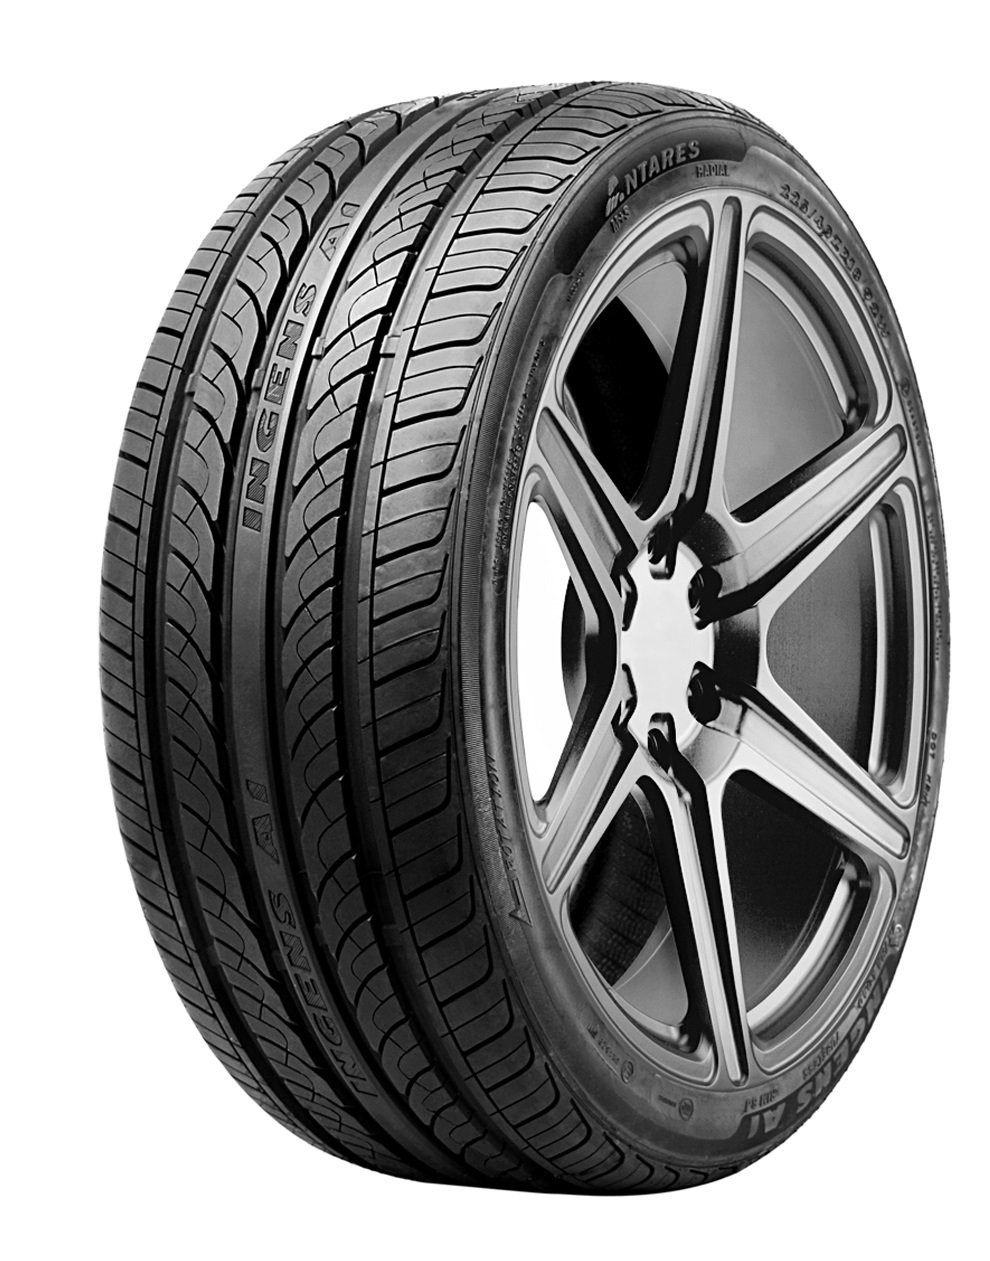 Antares INGENS A1 All-Season Radial Tire - 205/50R17 93V